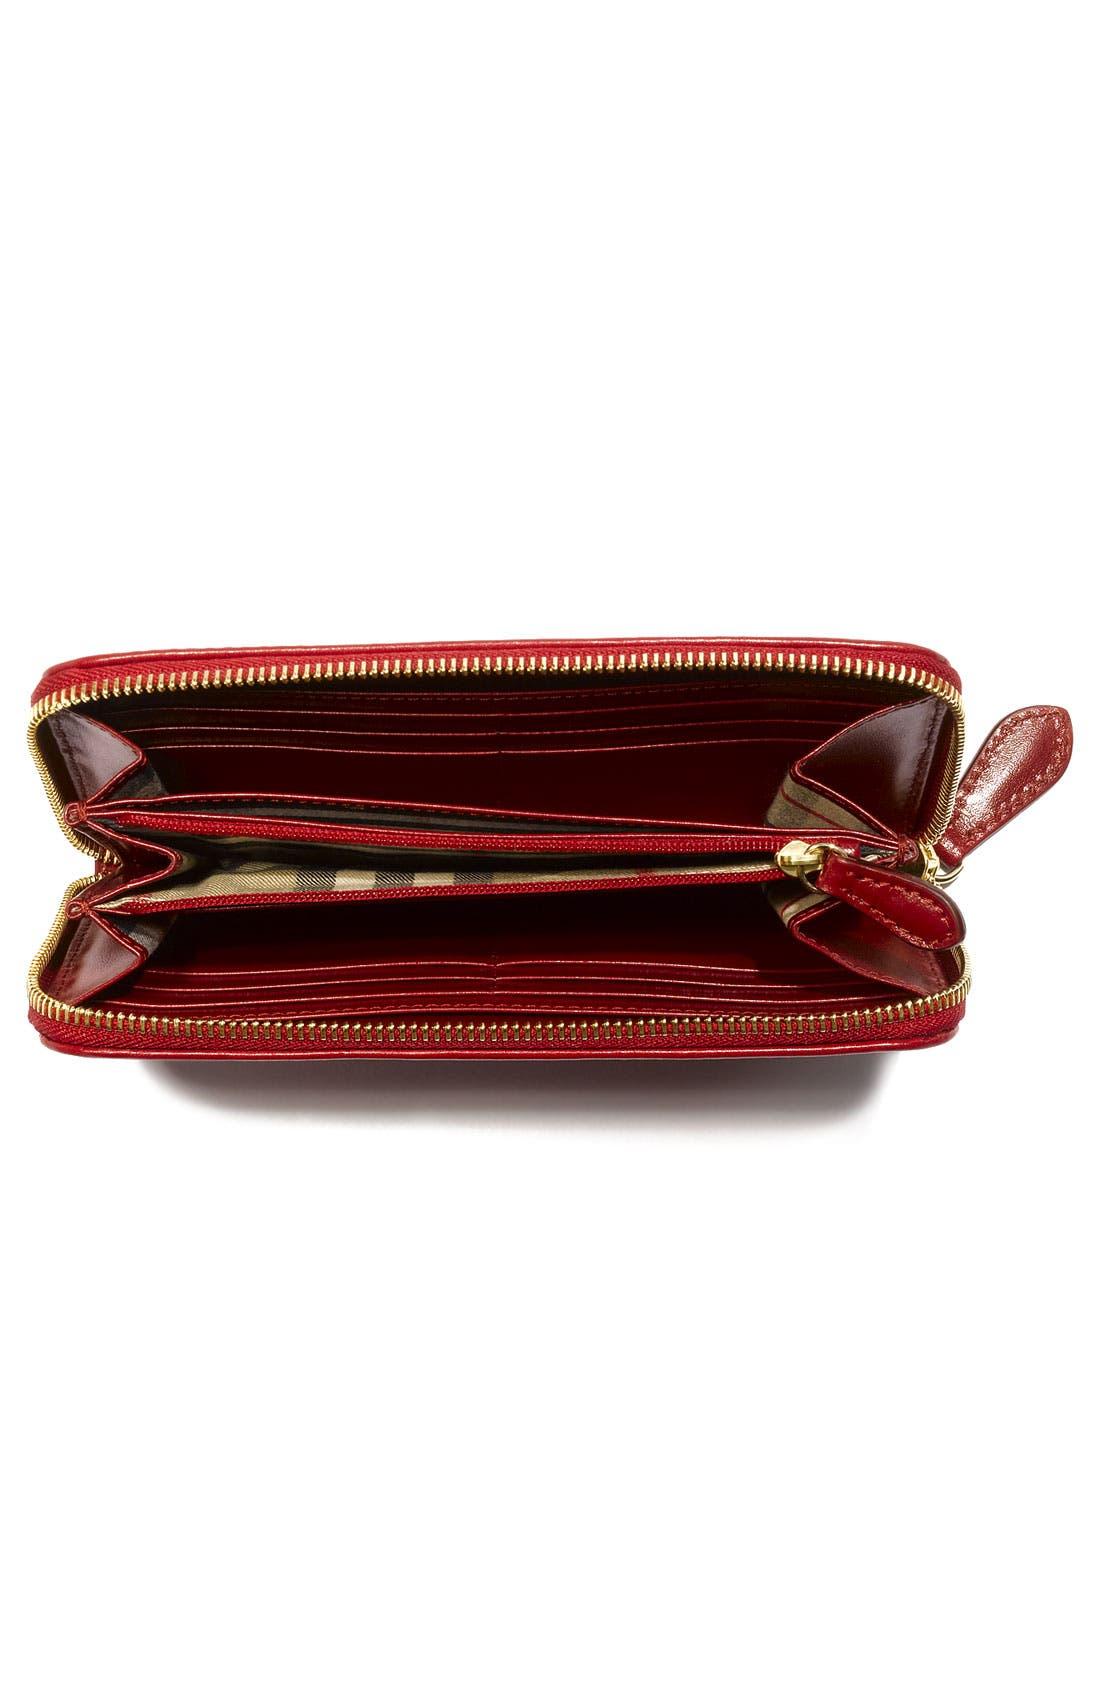 Alternate Image 3  - Burberry Zip Around Wallet